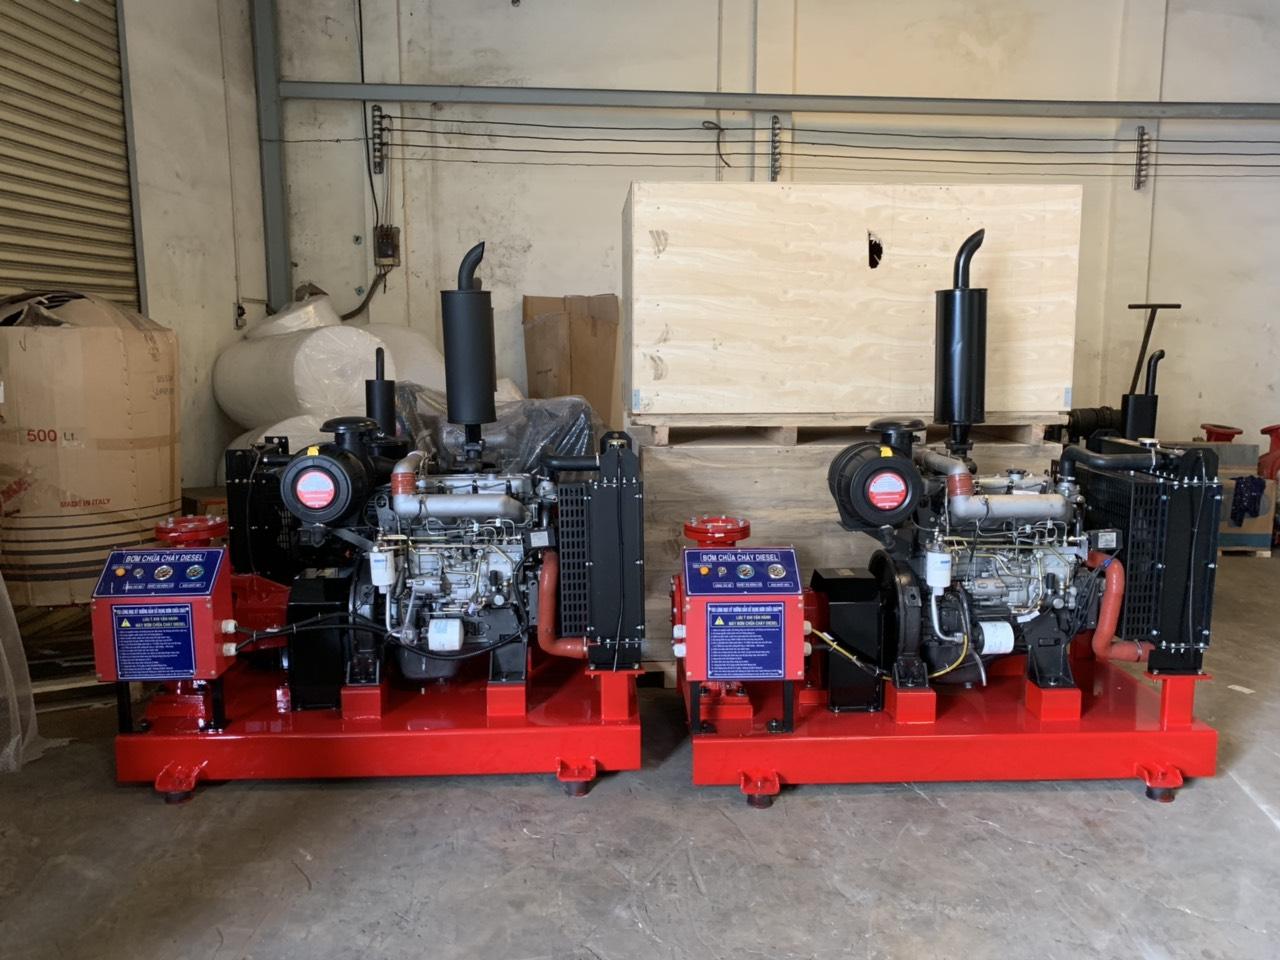 Cung cấp máy bơm Diesel V6BD Versar isuzu-Singapor